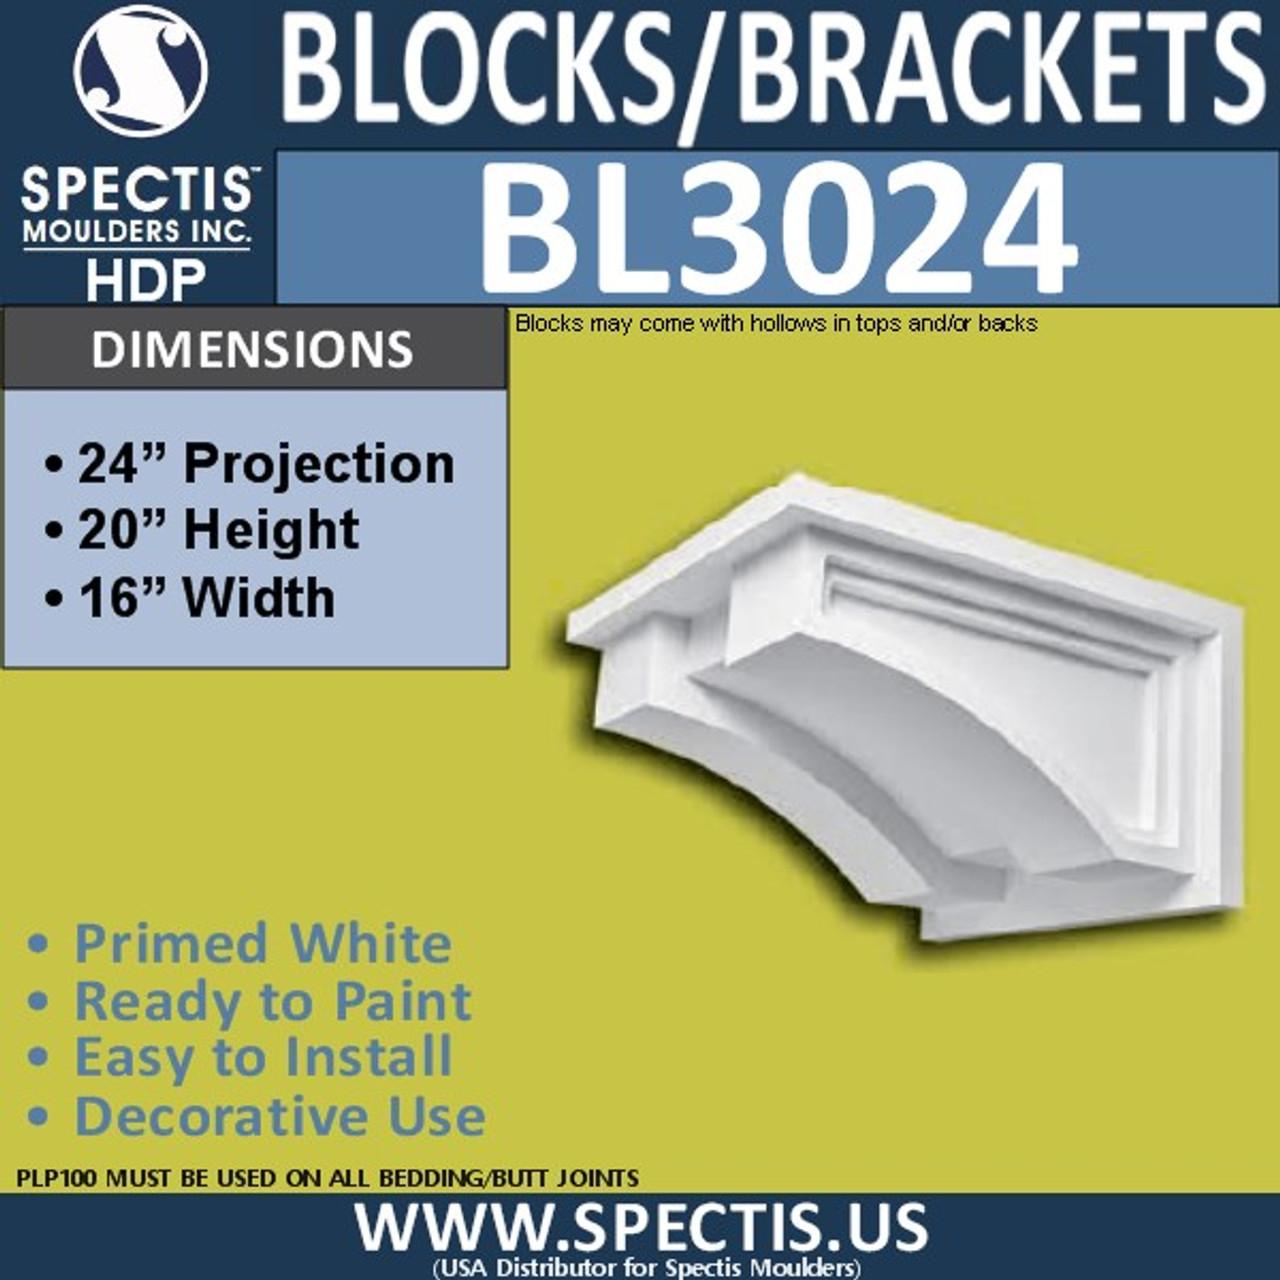 "BL3024 Eave Block or Bracket 24""W x 20""H x 24"" P"